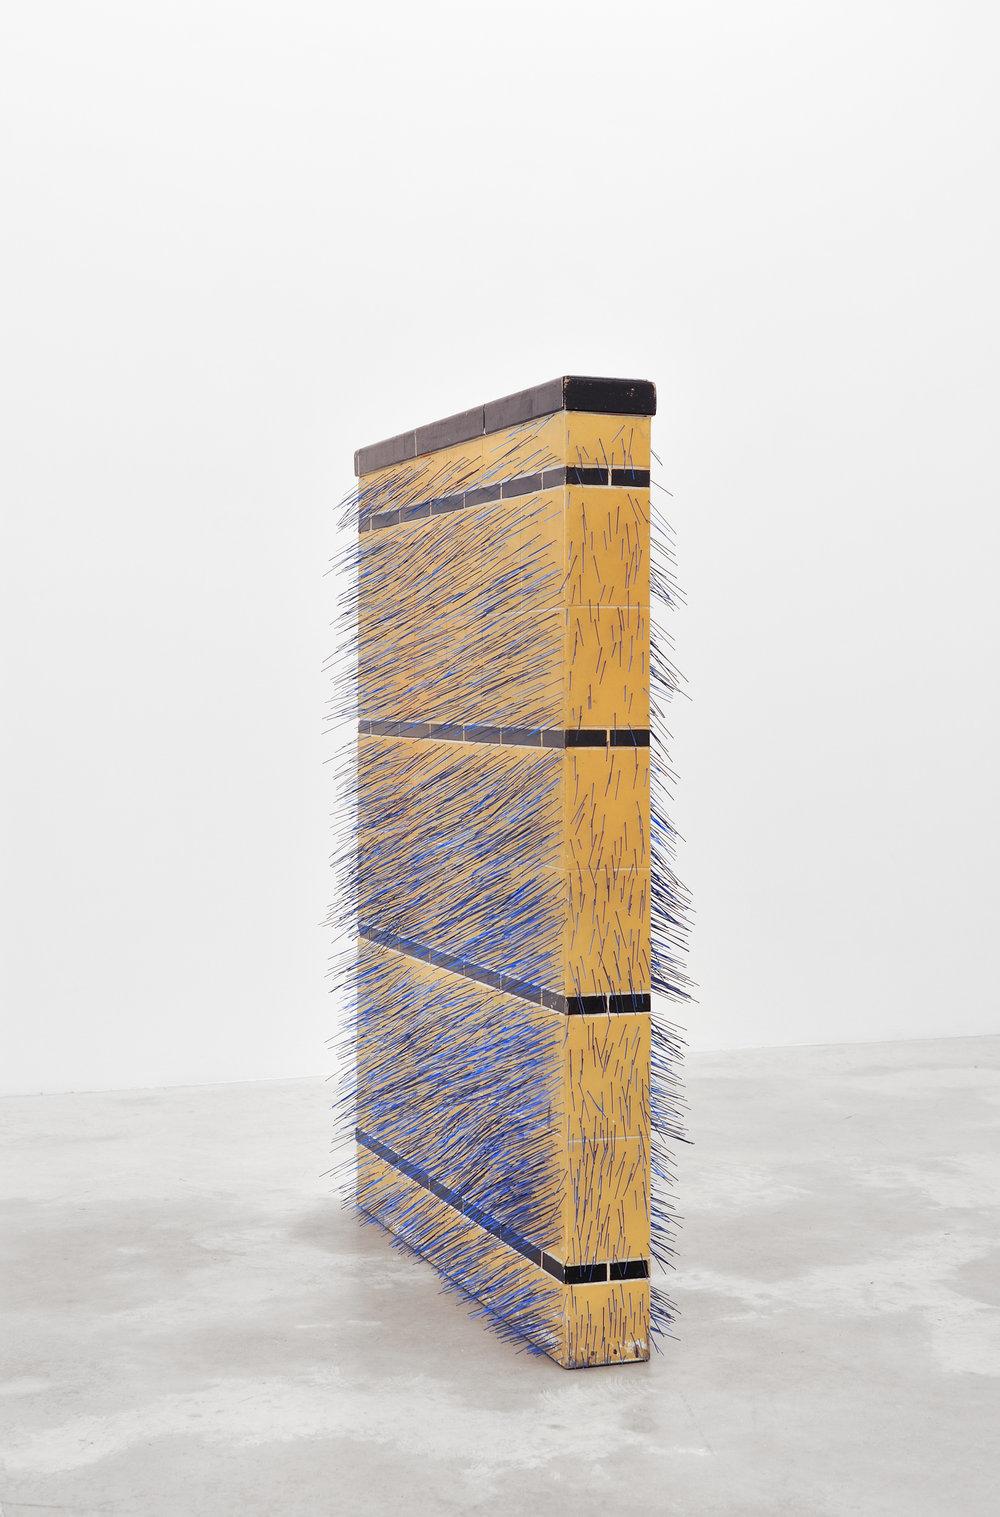 Five O'Clock Shadow, 2014 found wall, plastic bristles, glue 122 x 91,5 x 23 cm - 48 x 36 x 9 inches